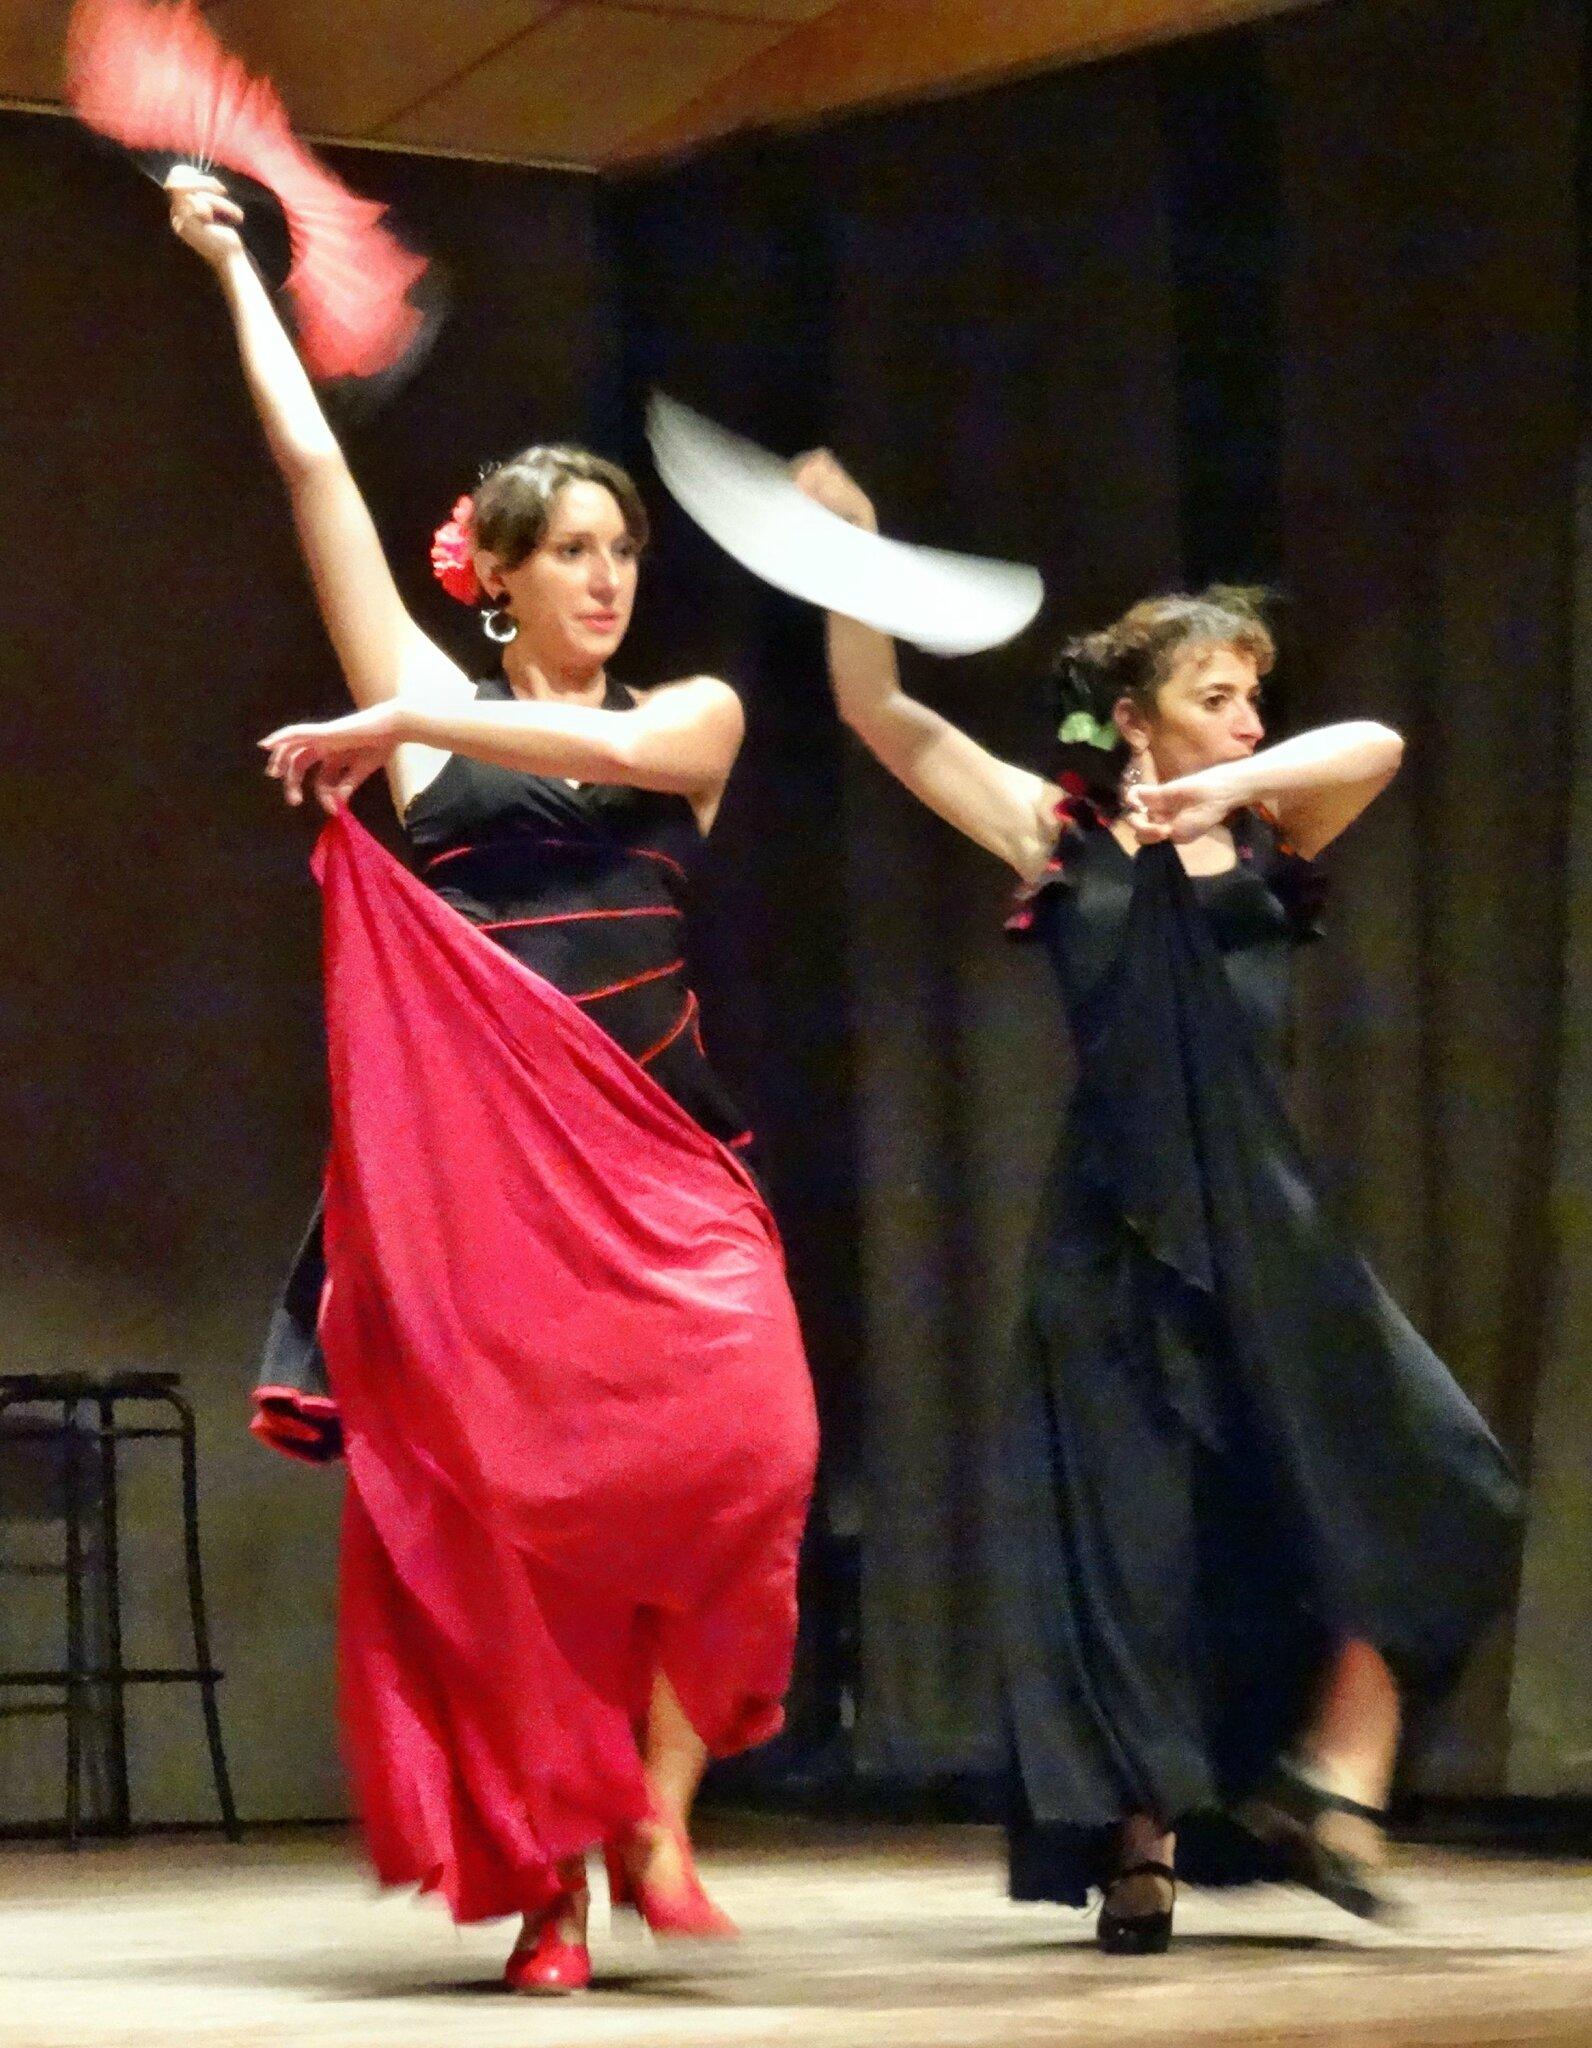 Gala SIN EMBARGO 28 juin 2015 Sainte-Croix-du-Mont (42)